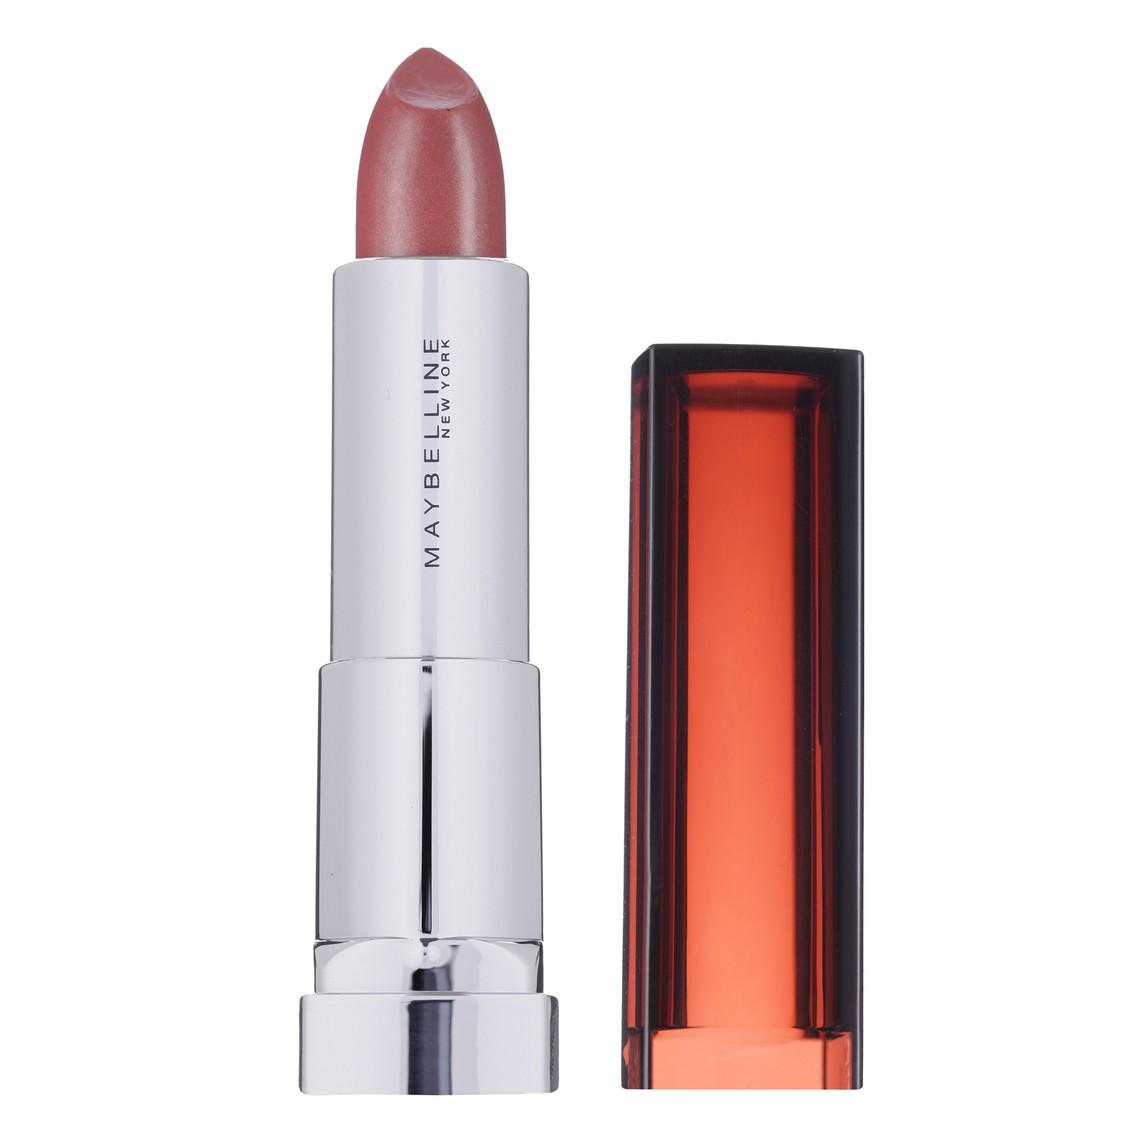 Maybelline New York Color Sensational Lipstick